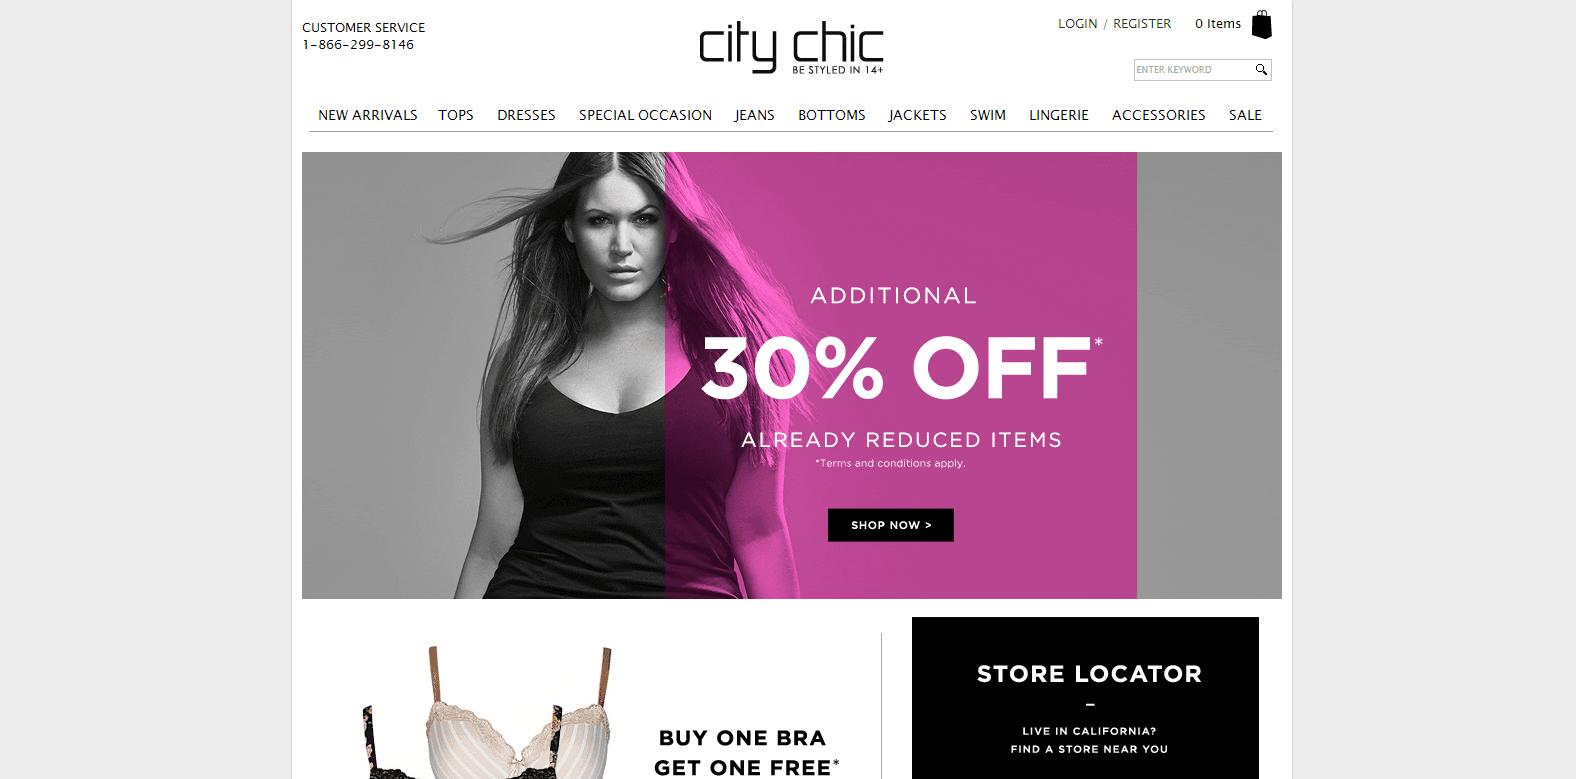 Magento Ecommerce Design - City Chic Online